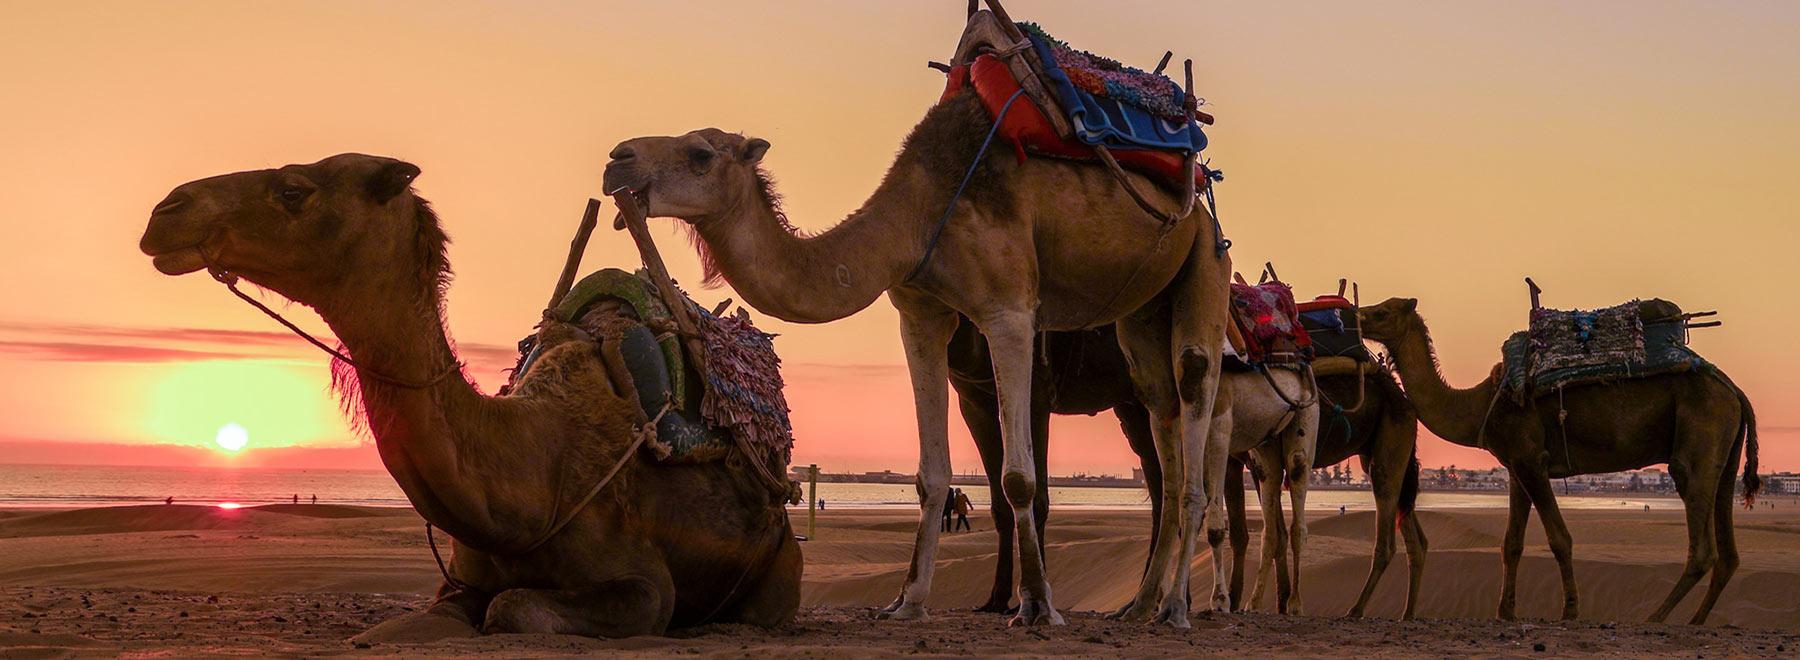 Kiteurlaub-Essaouira